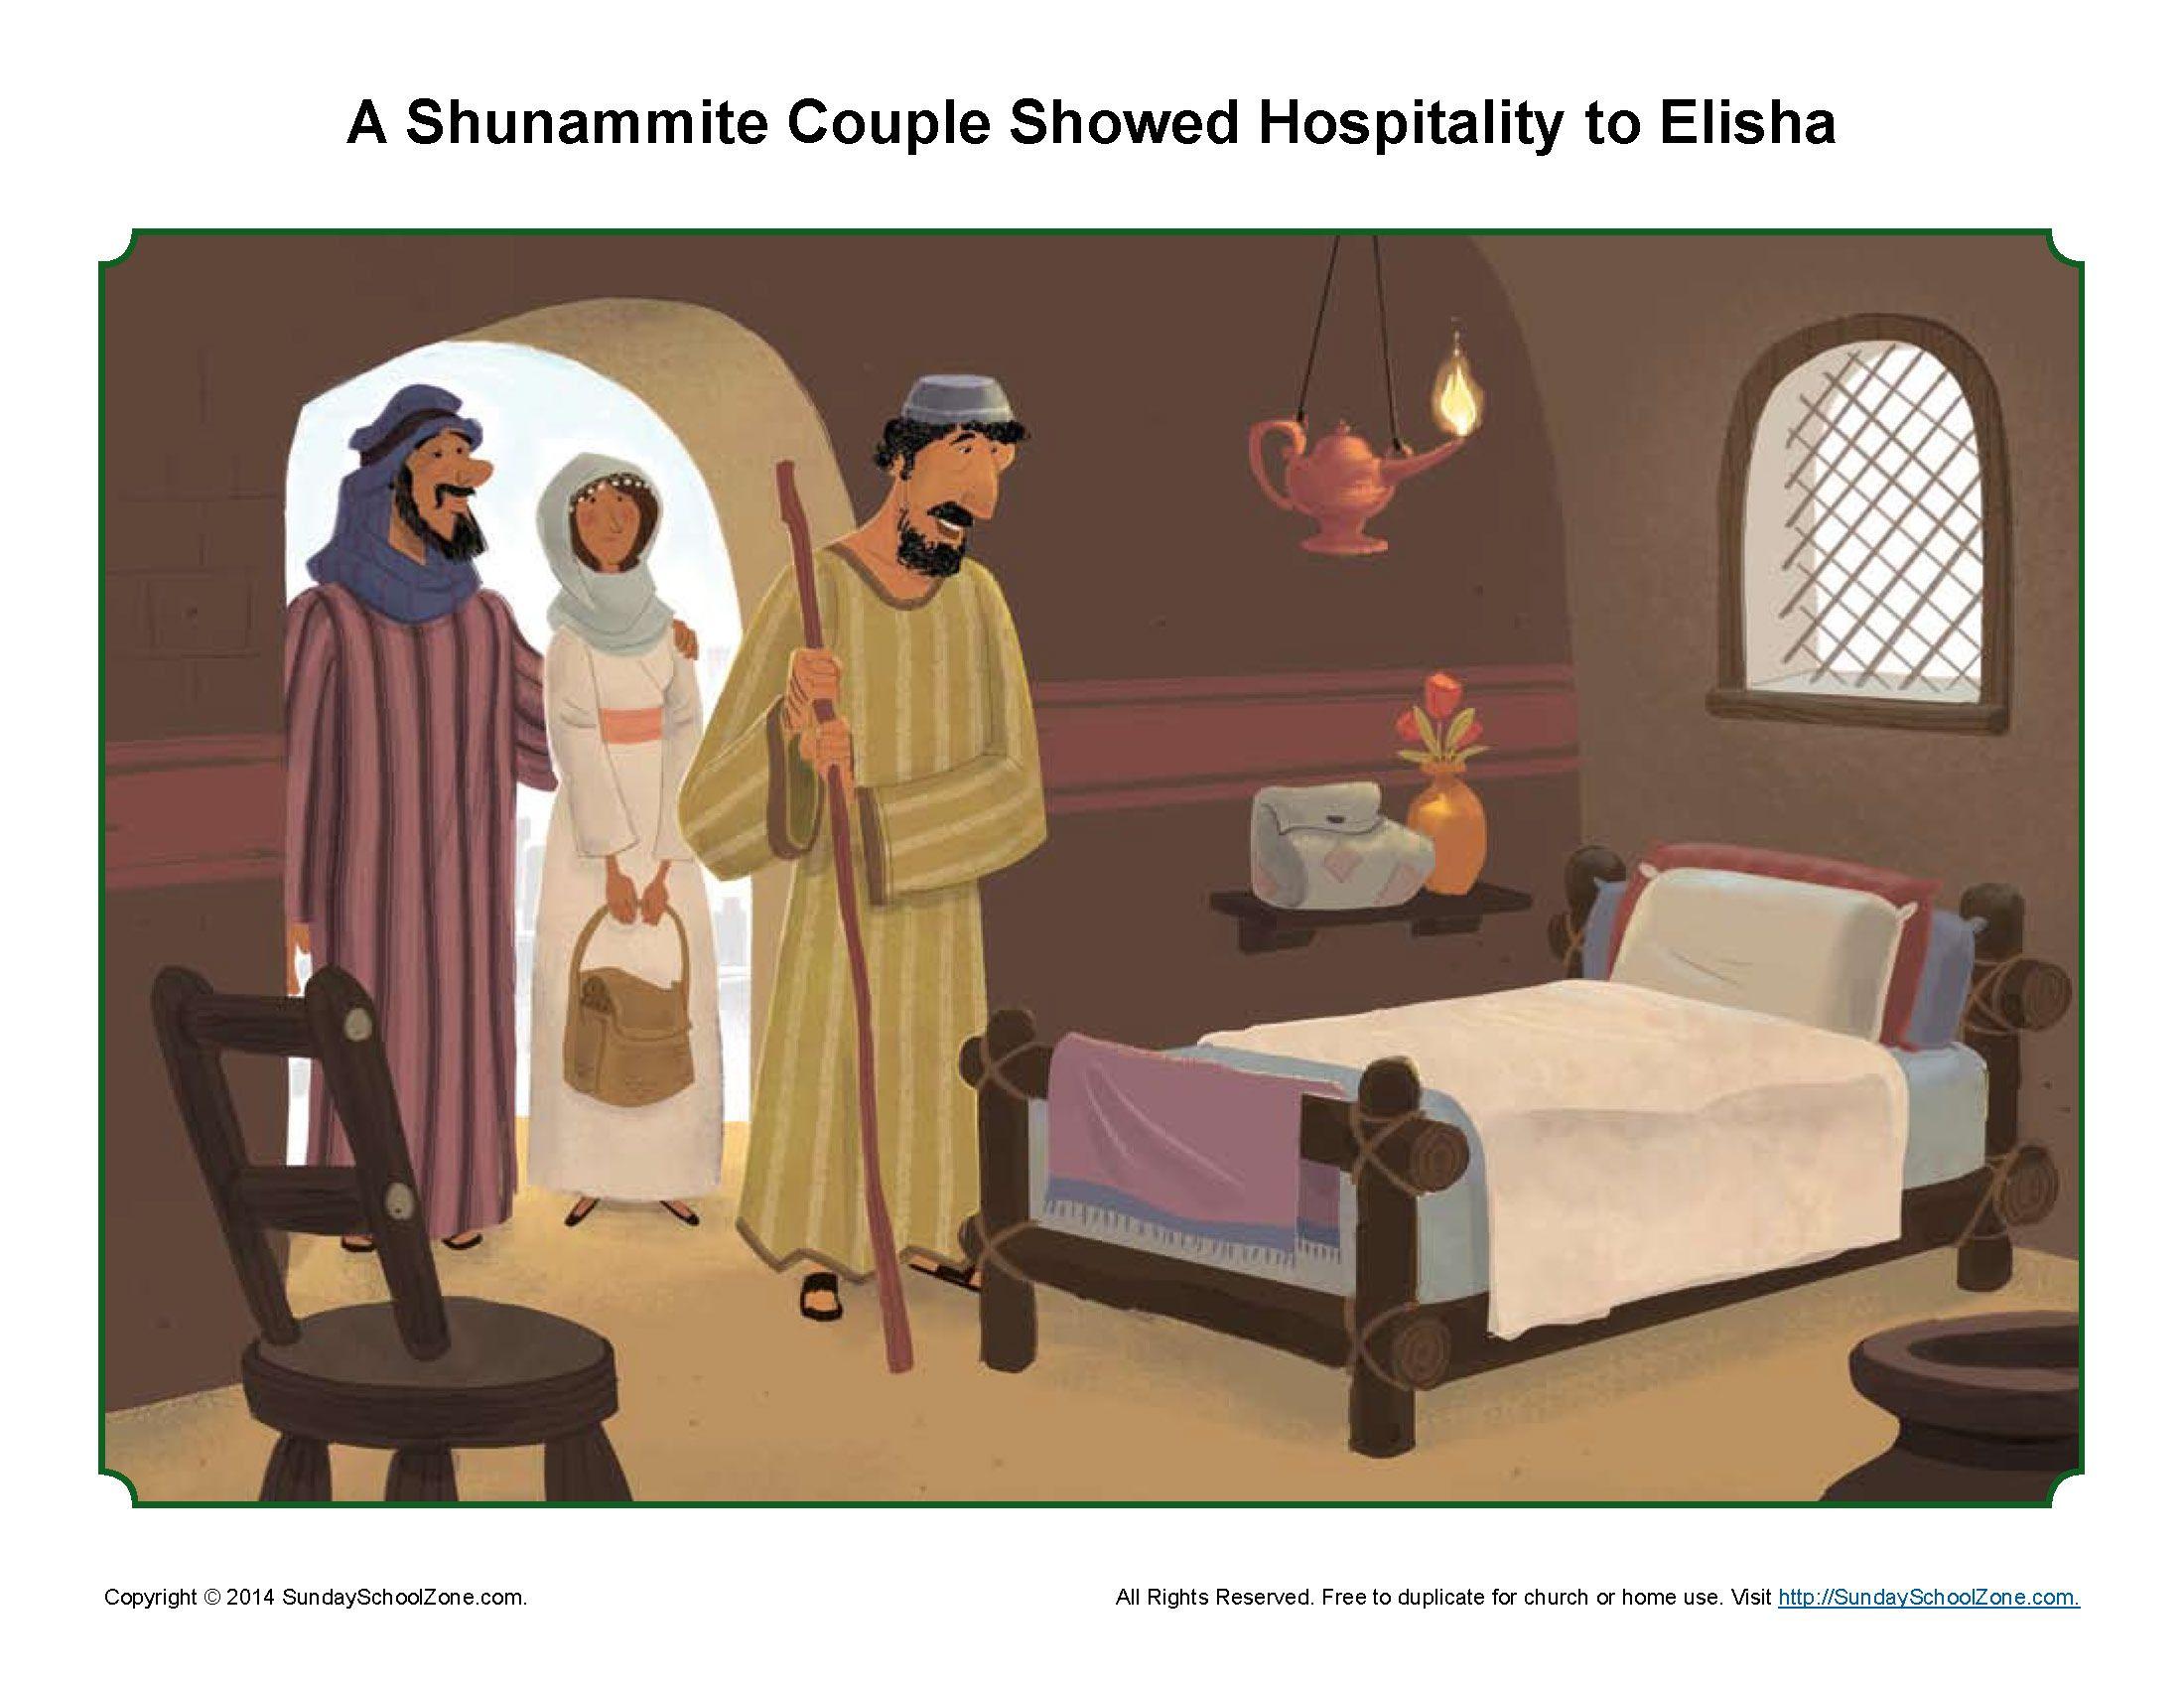 A Shunammite Couple Showed Hospitality To Elisha Story Illustration